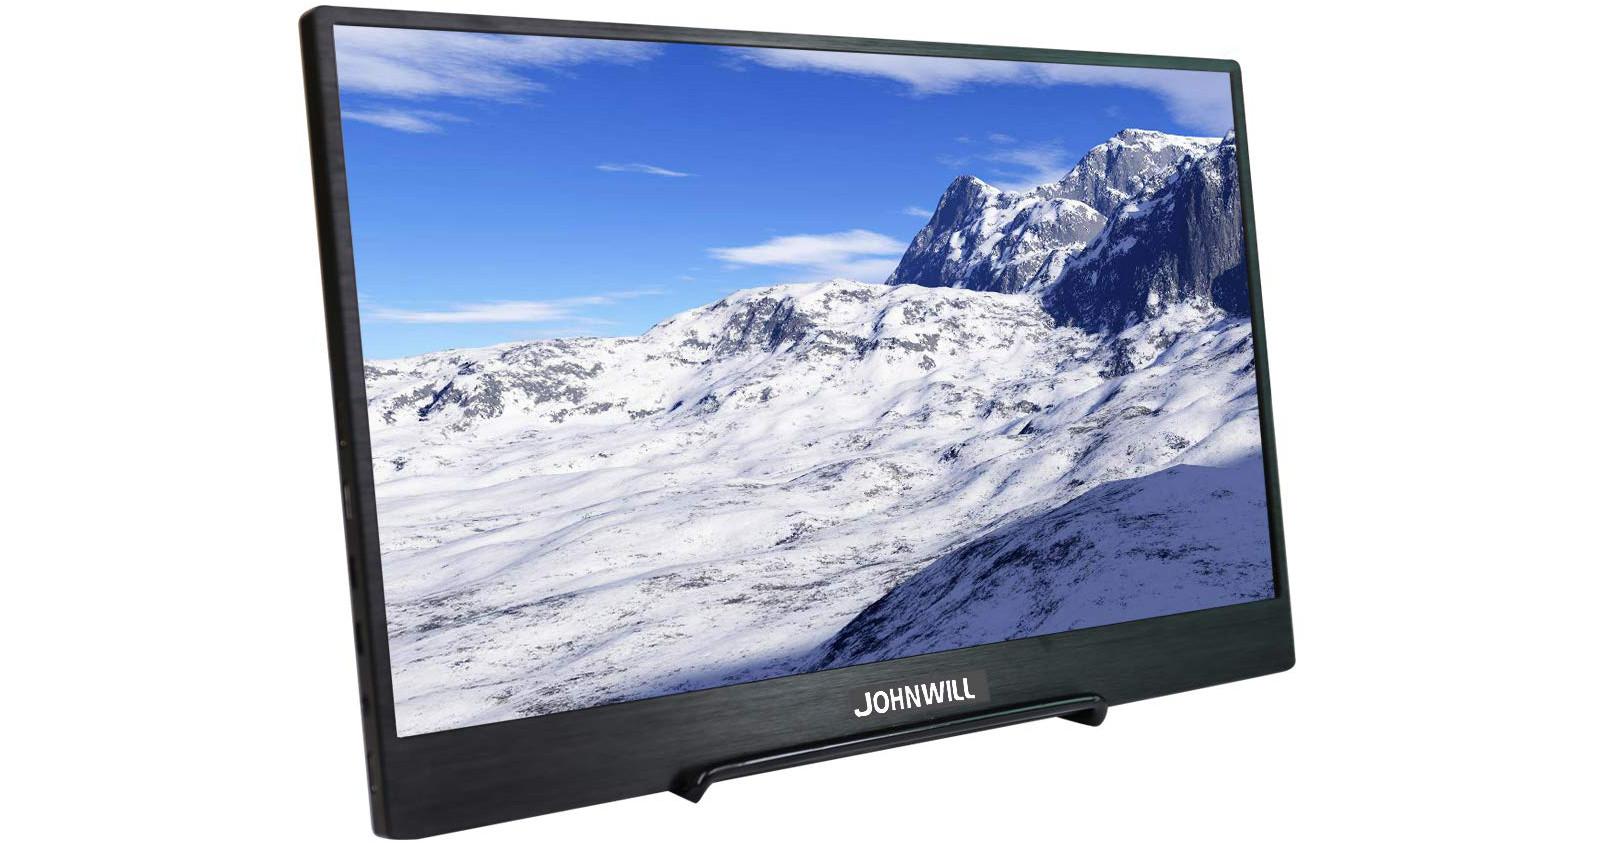 JOHNWILL 13,3 Zoll Monitor